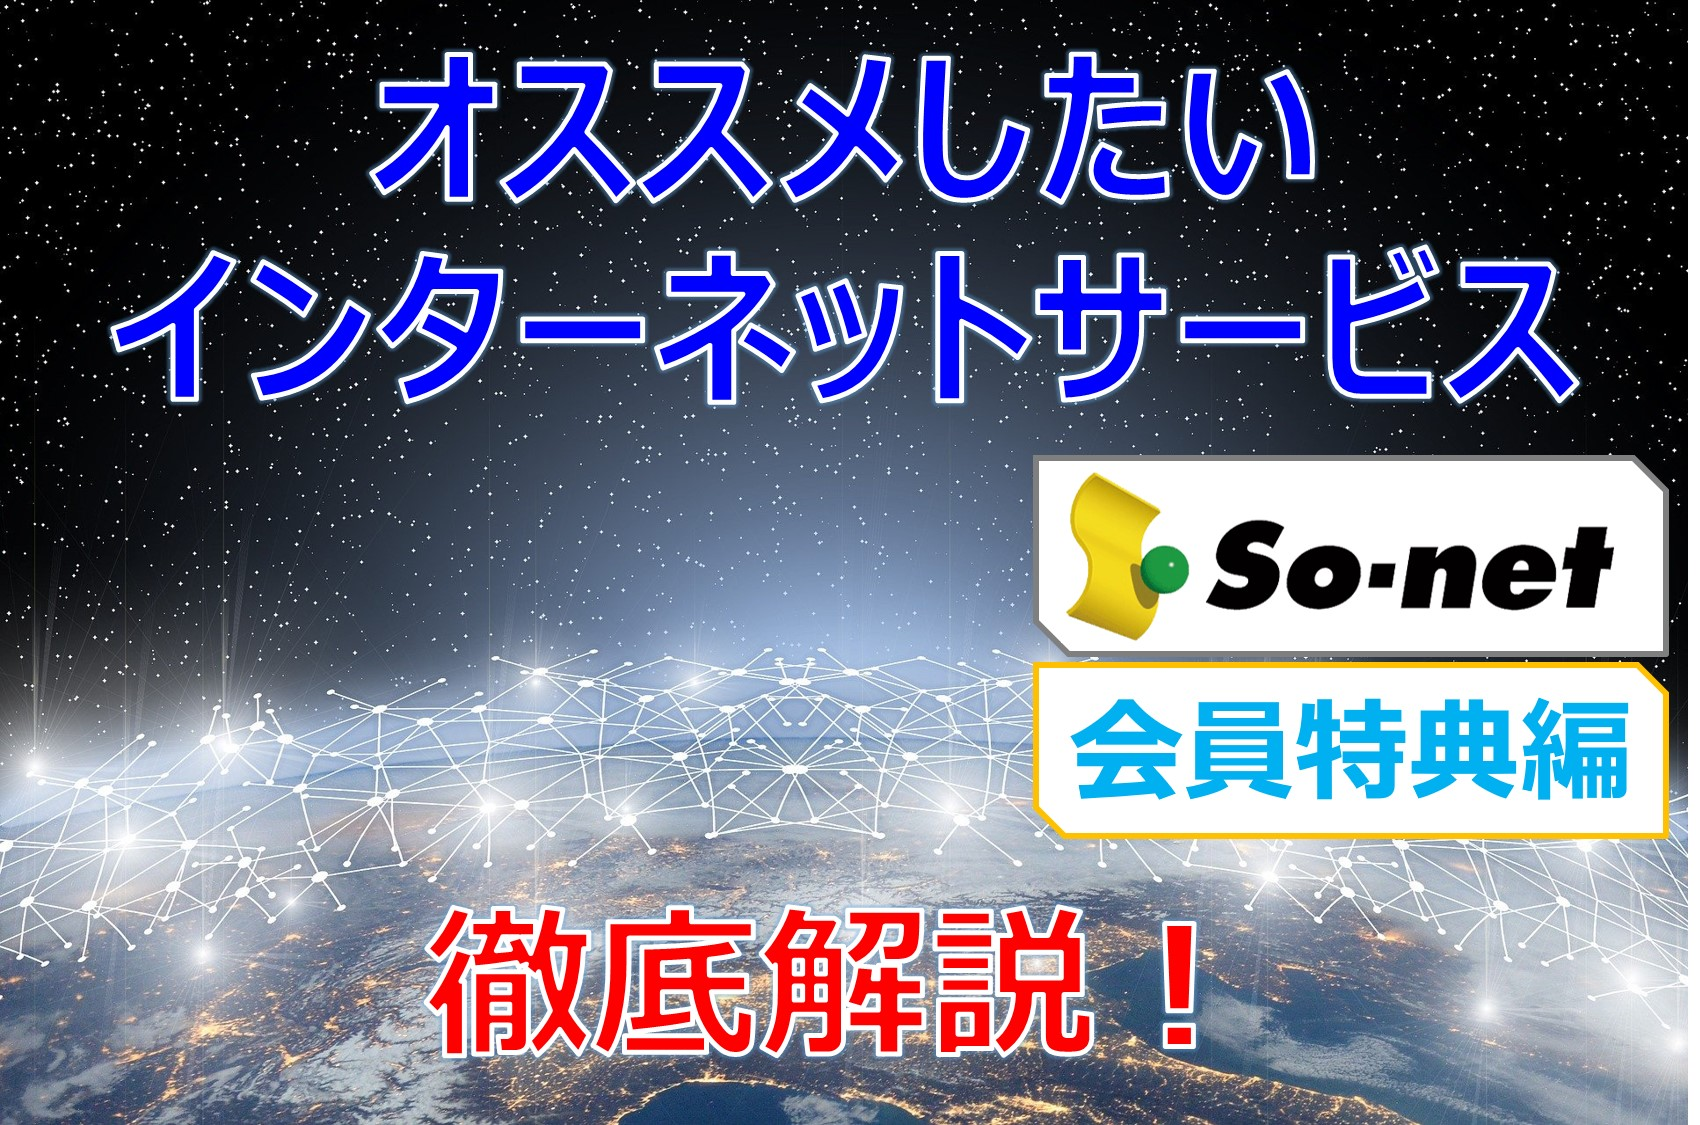 So-net光で快適インターネット 入会後の特典がアツい!